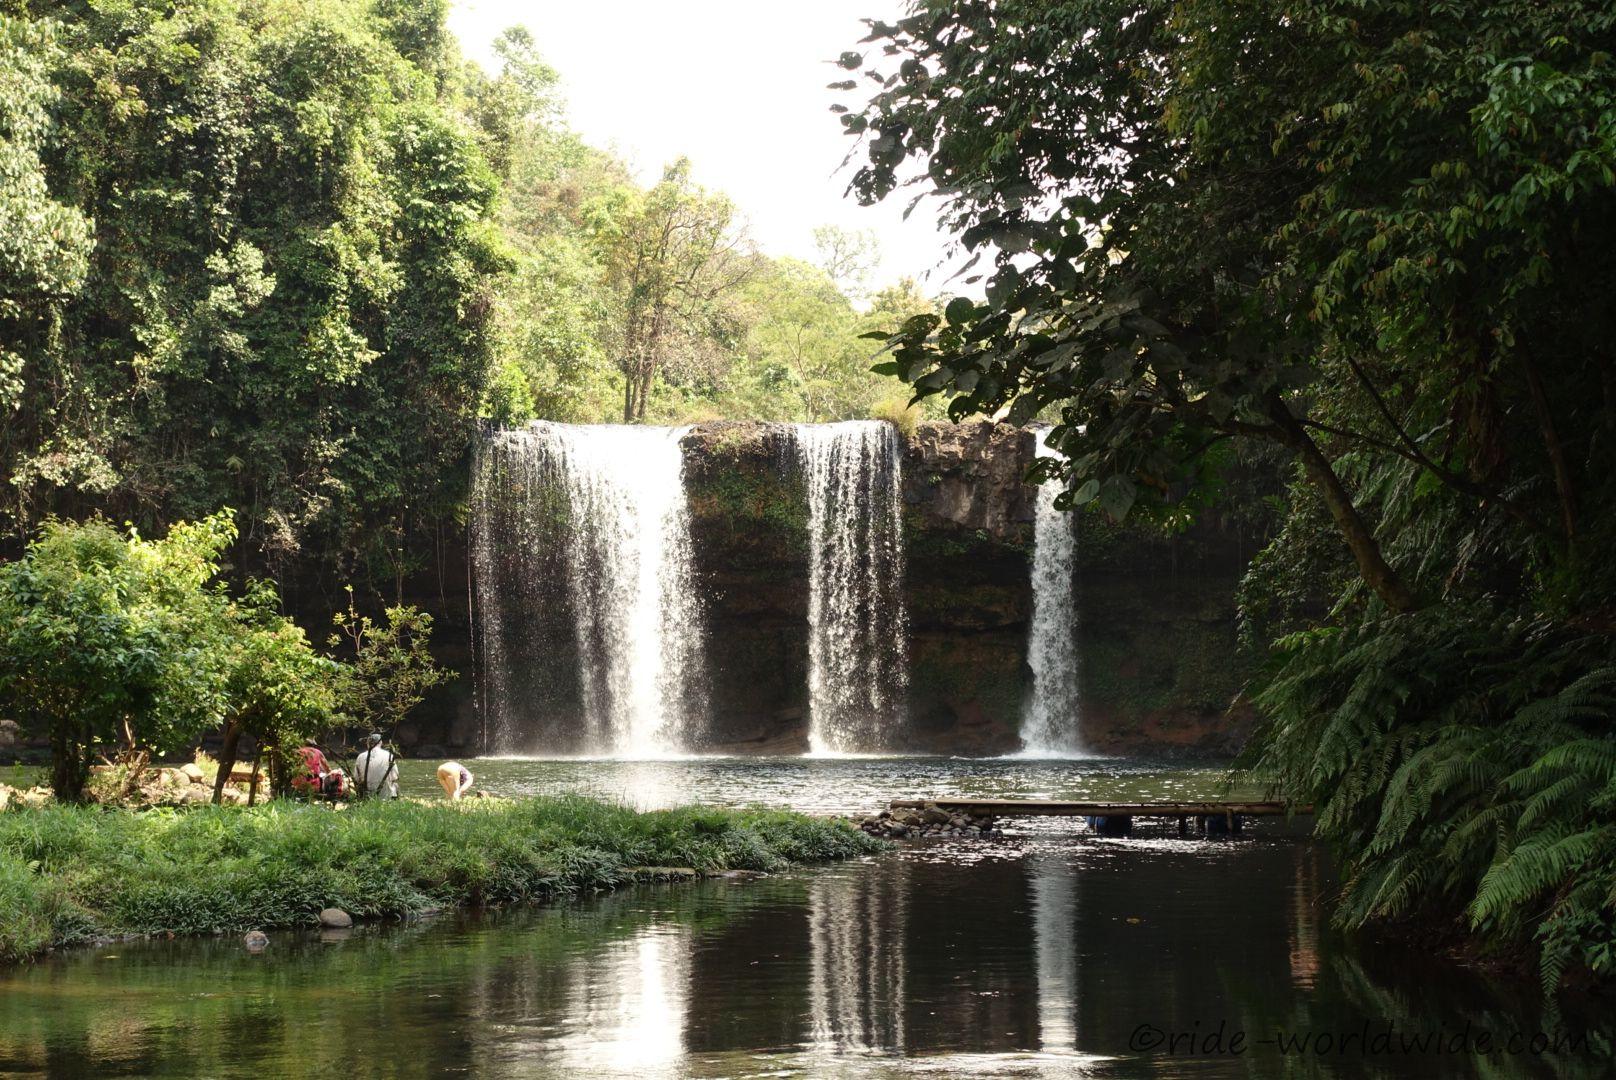 Champee Wasserfall auf dem Bolavenplateau